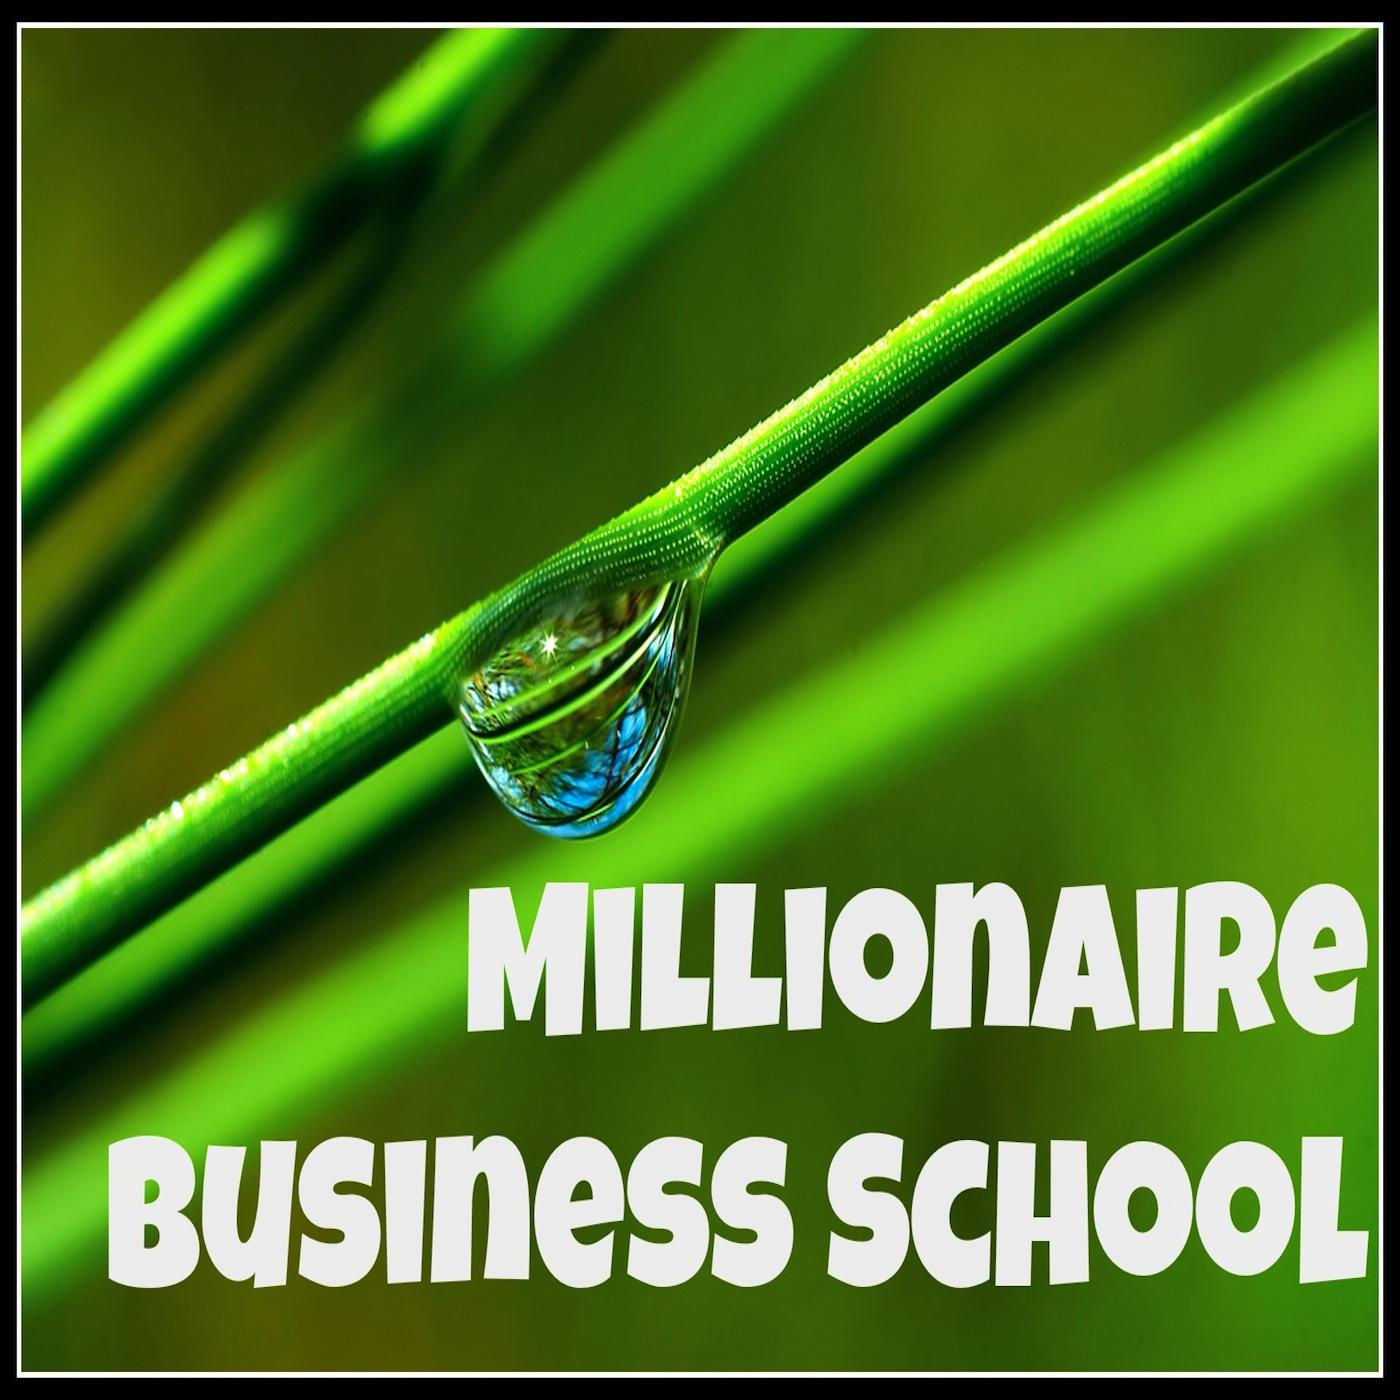 Millionaire Business School